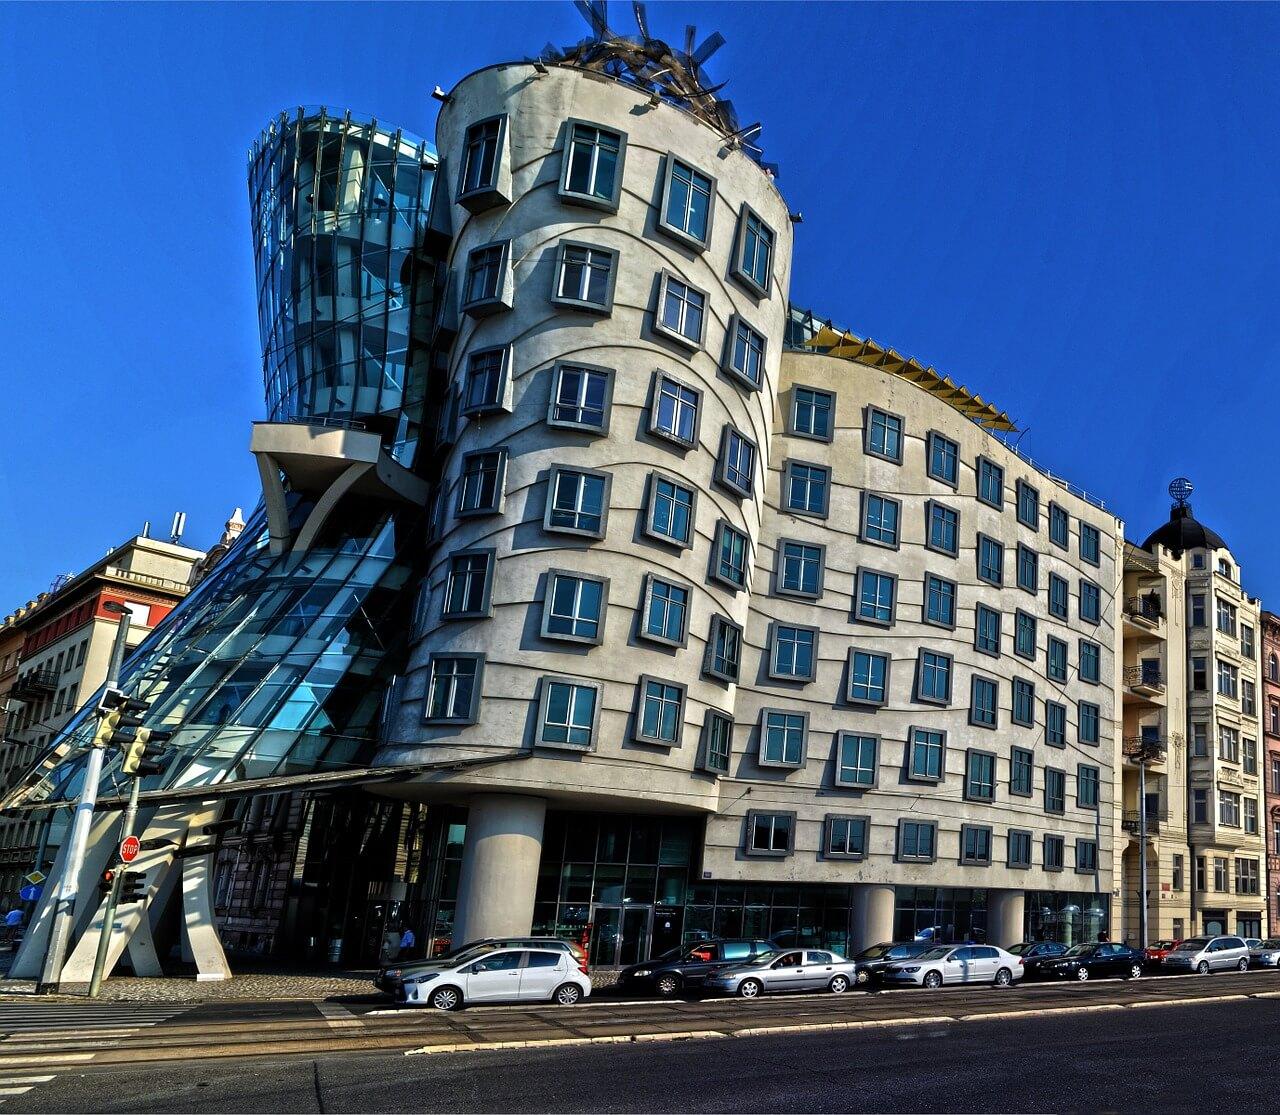 building-922531_1280